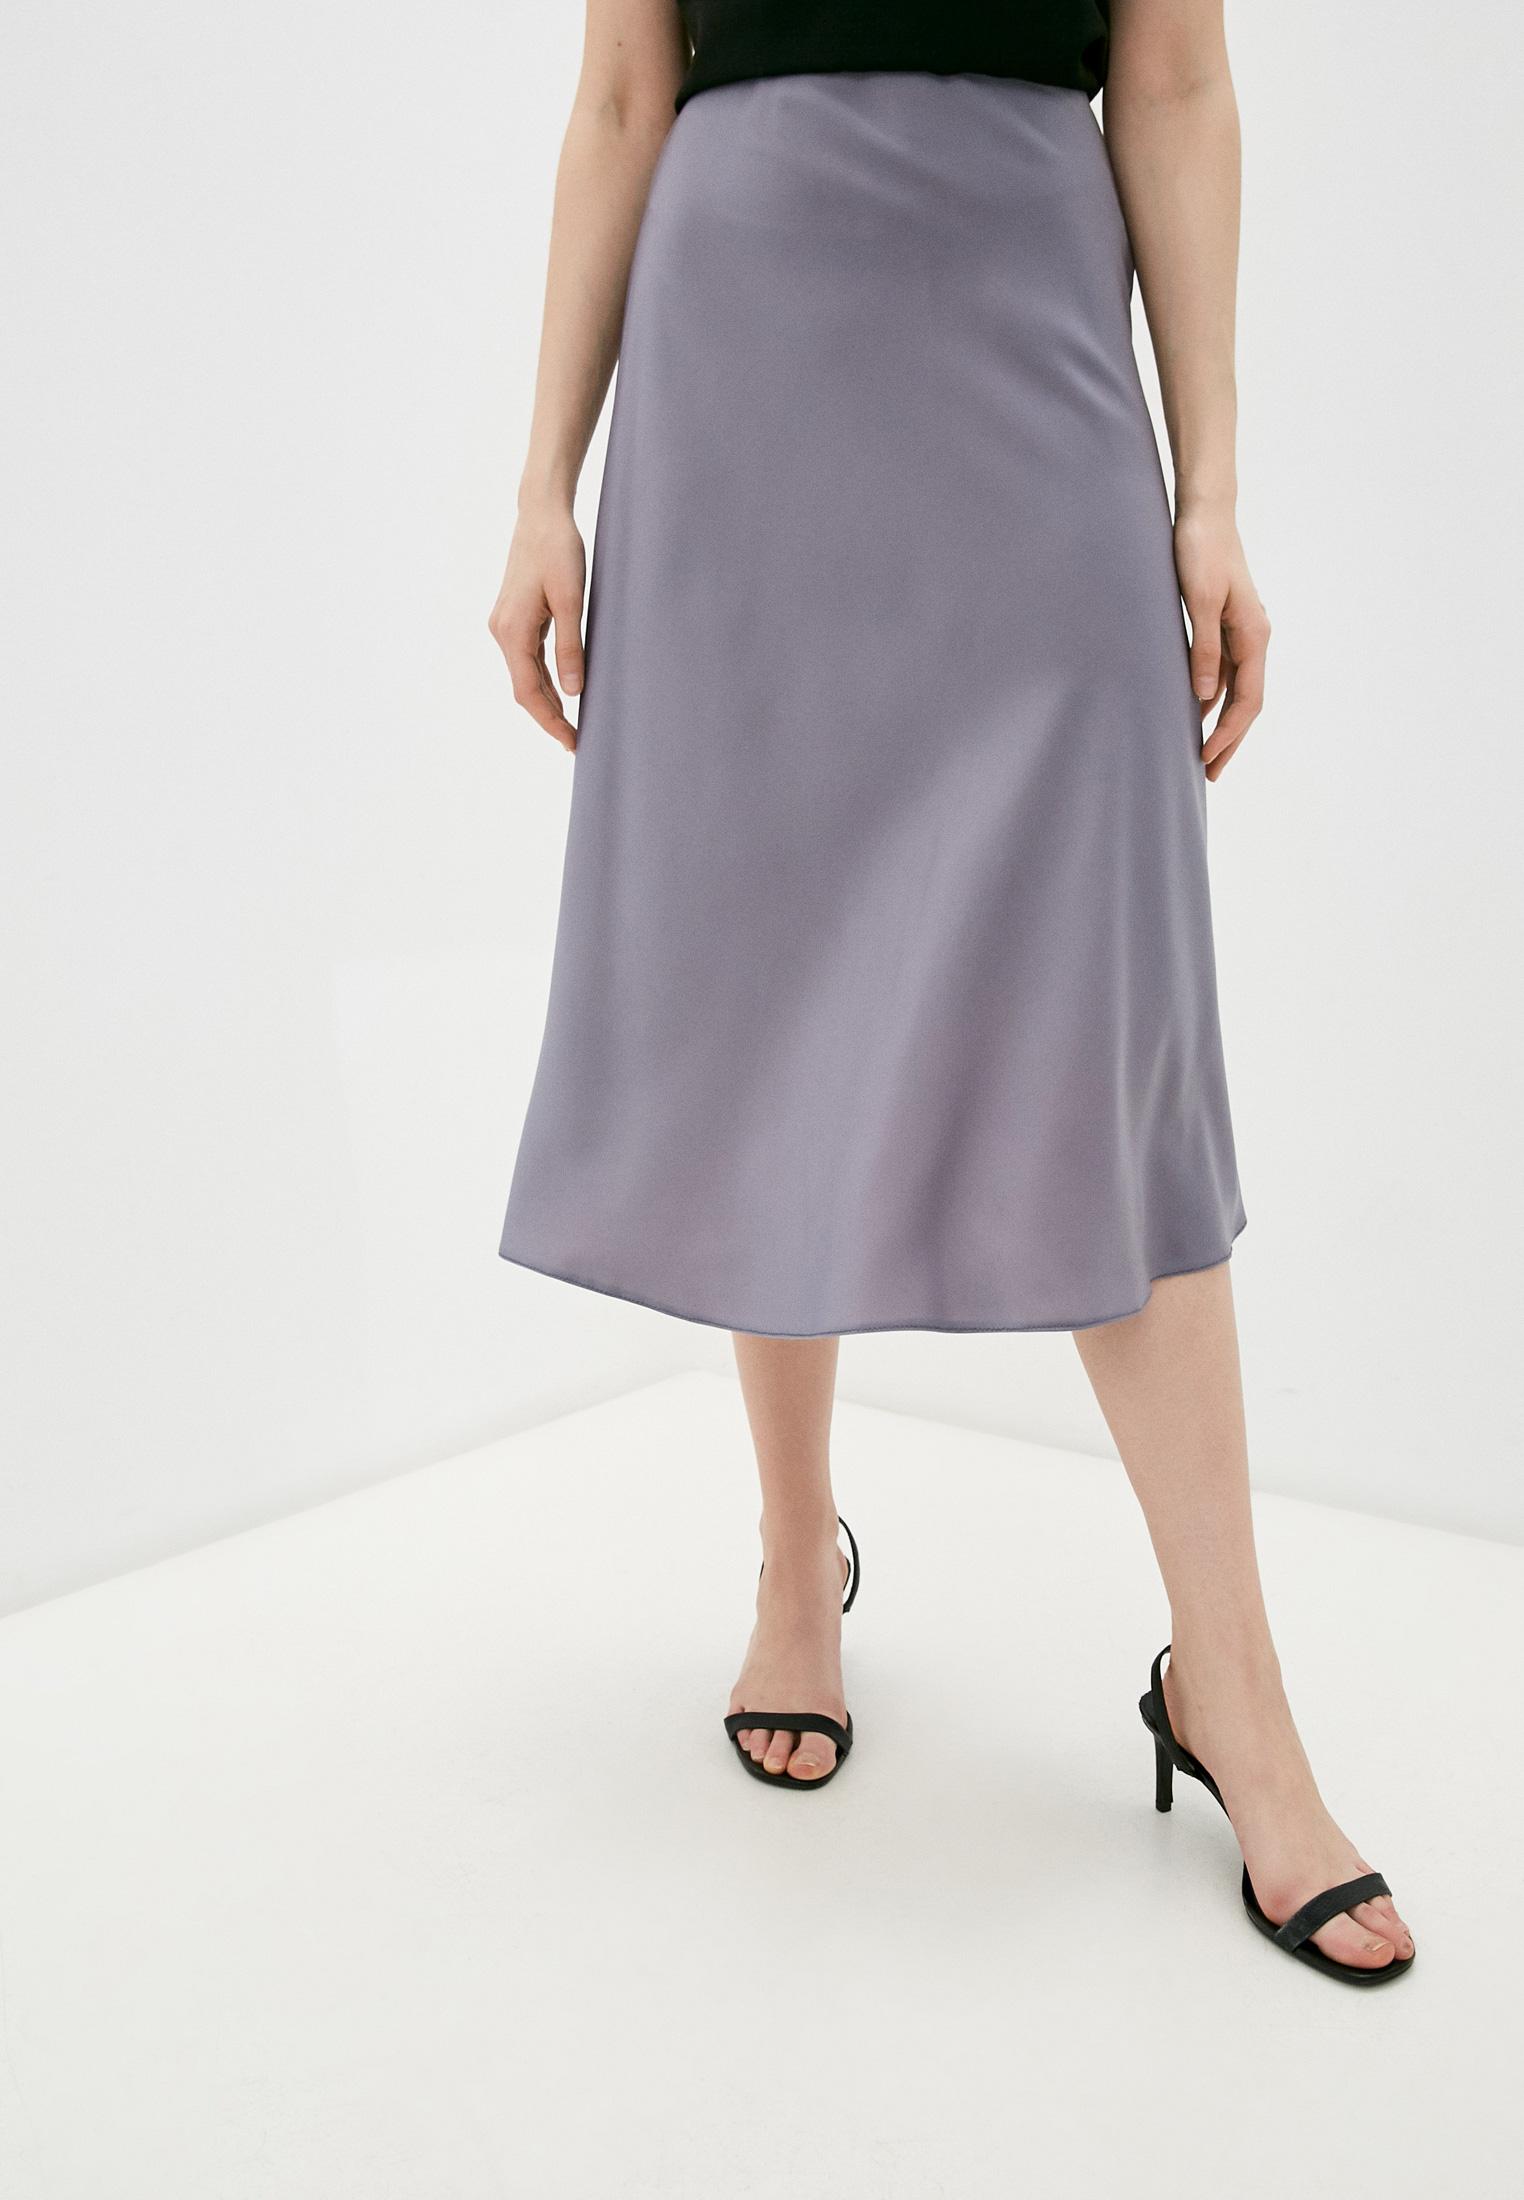 Широкая юбка Rainrain Юбка Rainrain